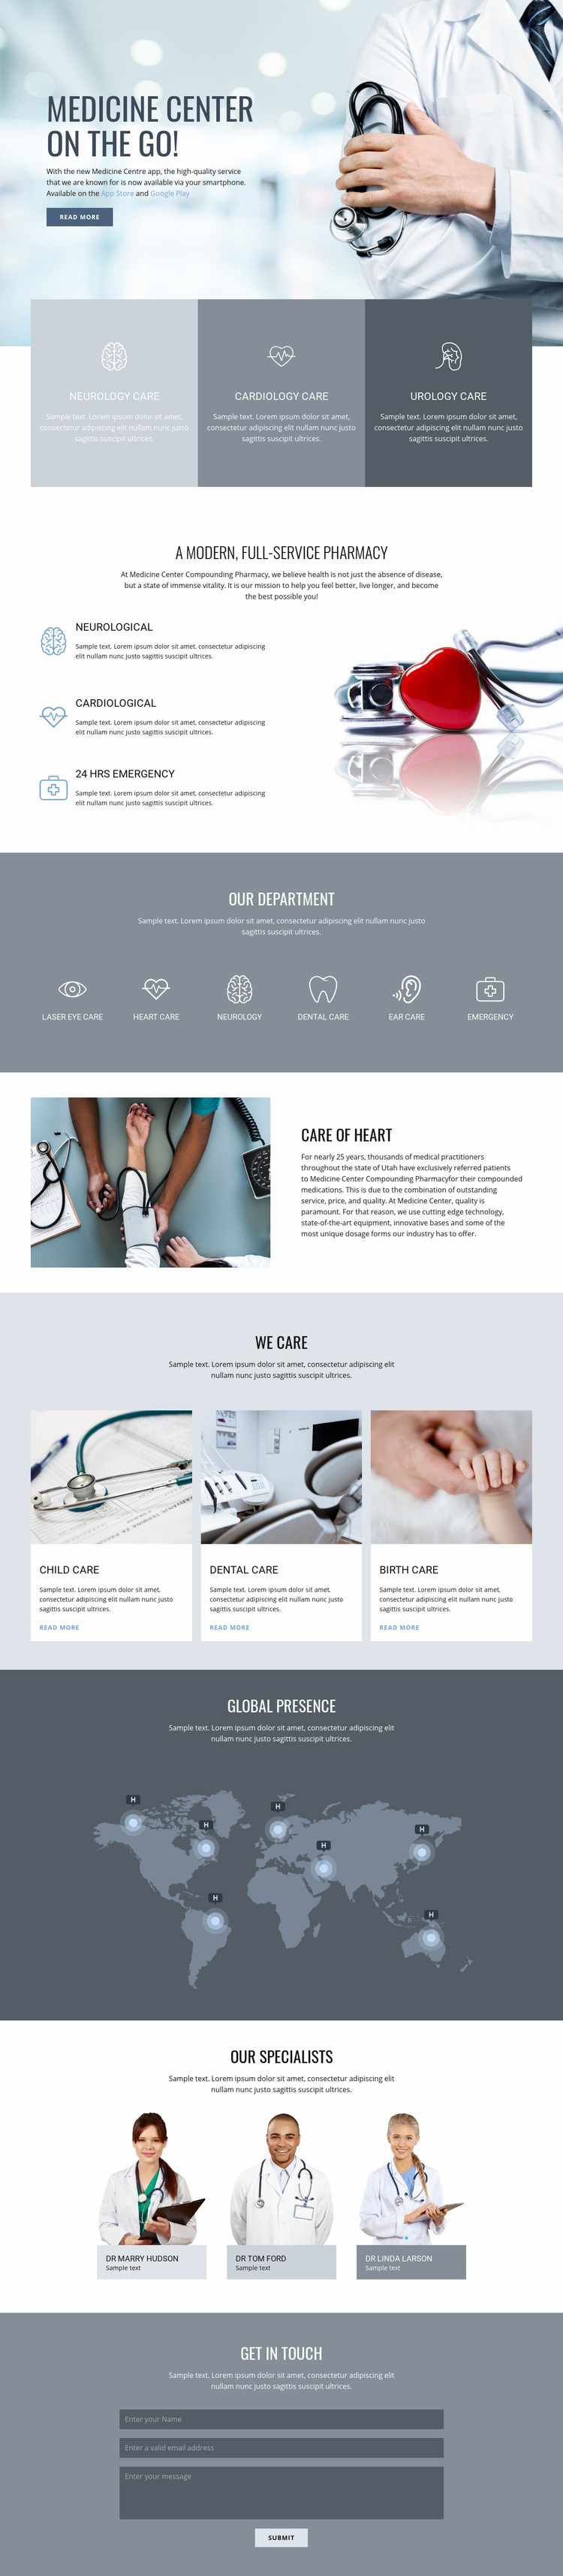 Center of quality medicine Web Page Designer